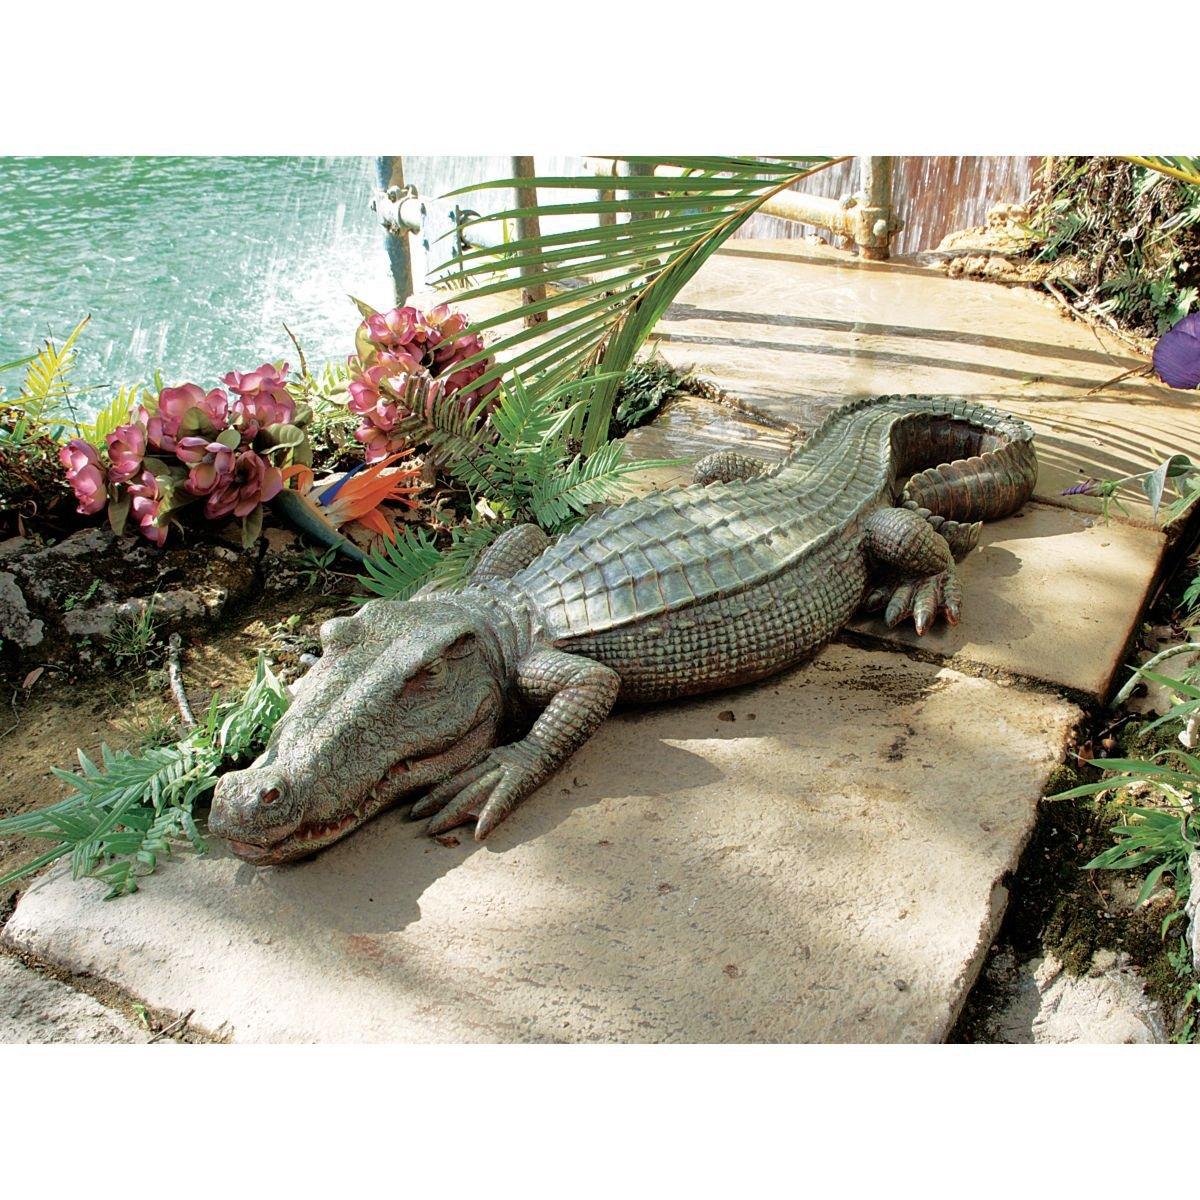 Marvelous Alligator Sculpture Home Garden Pond Crocodile Outdoor Patio Gator Decor  Statue